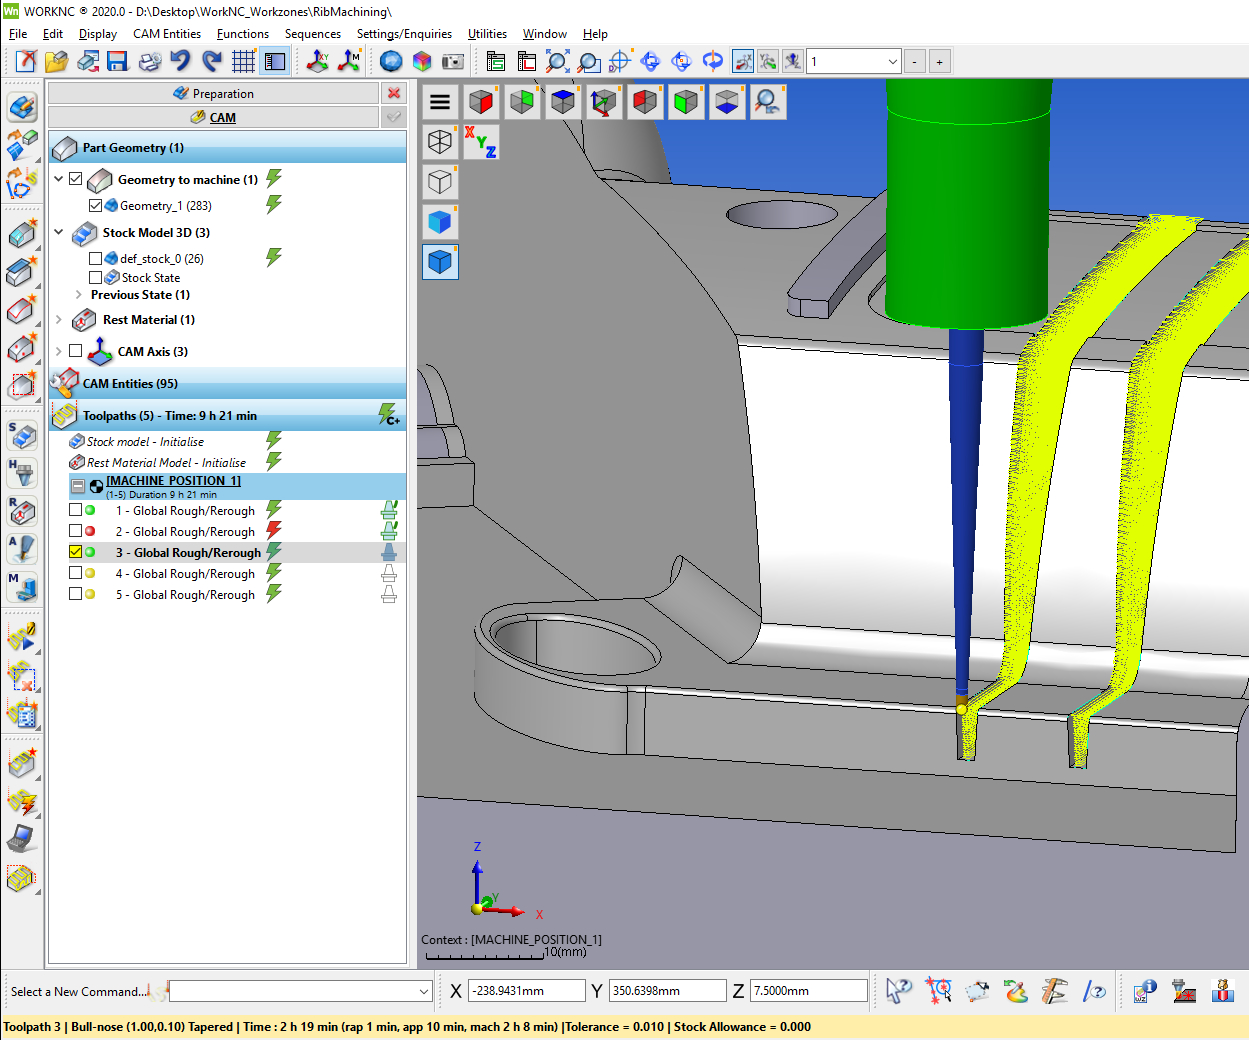 Mastercam's CAD for CAM Design Software Adds More